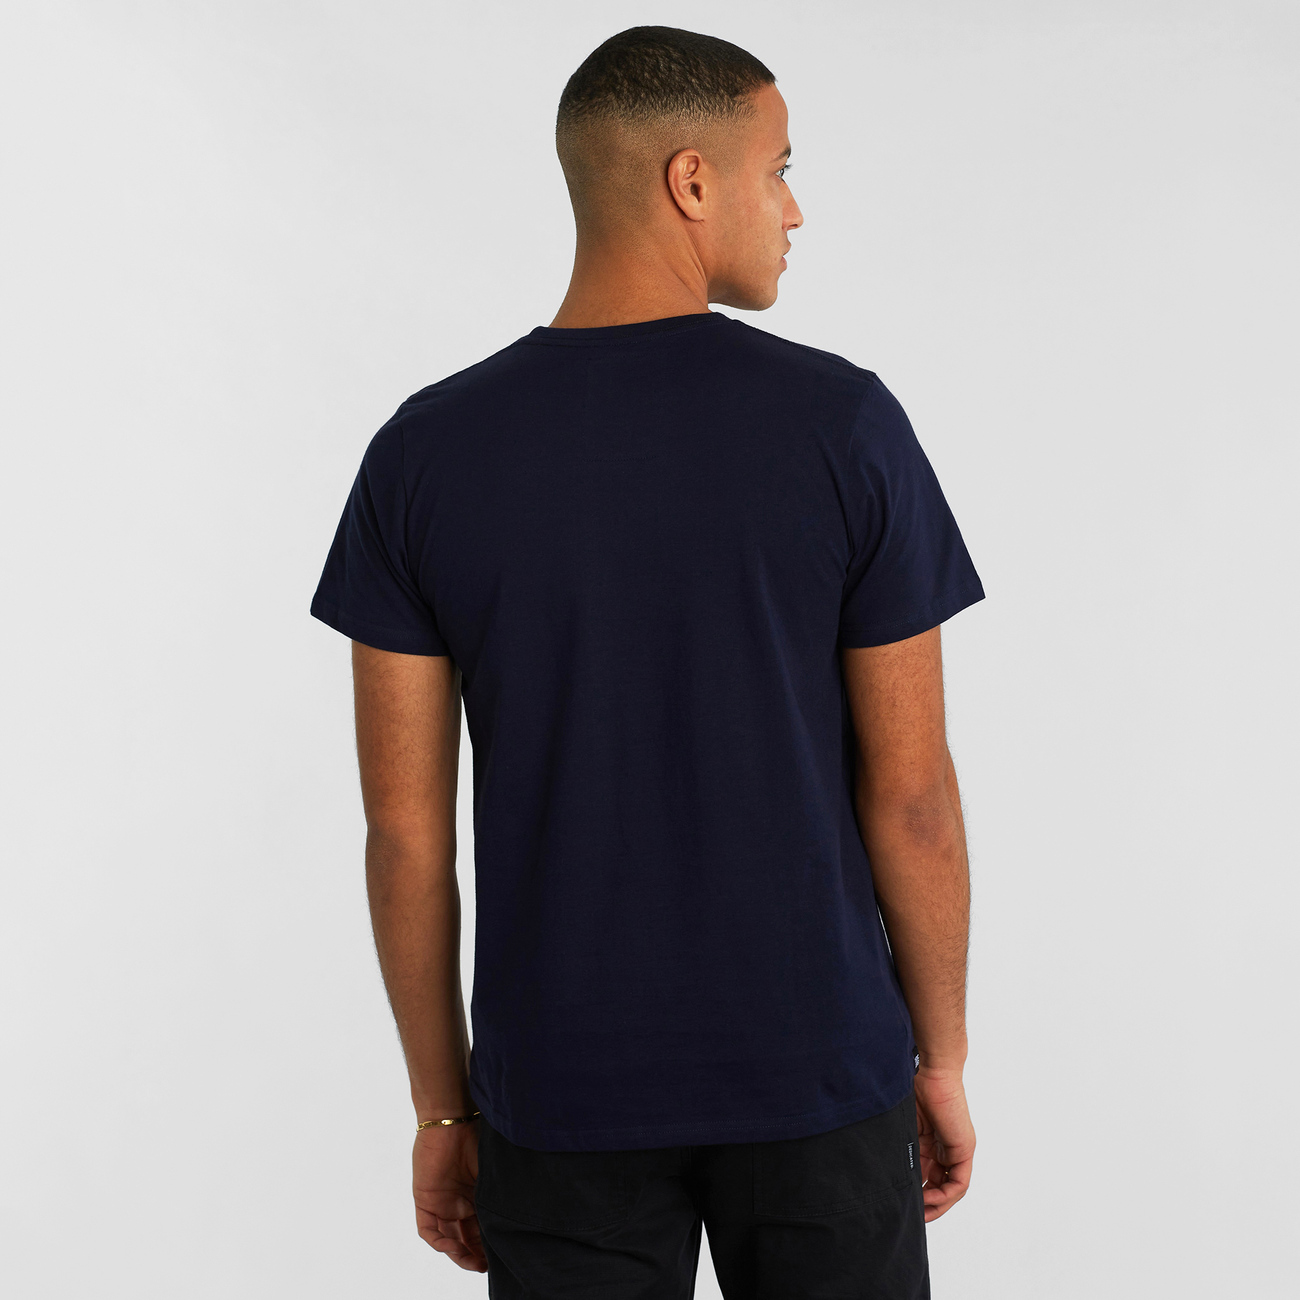 T-shirt Stockholm Education